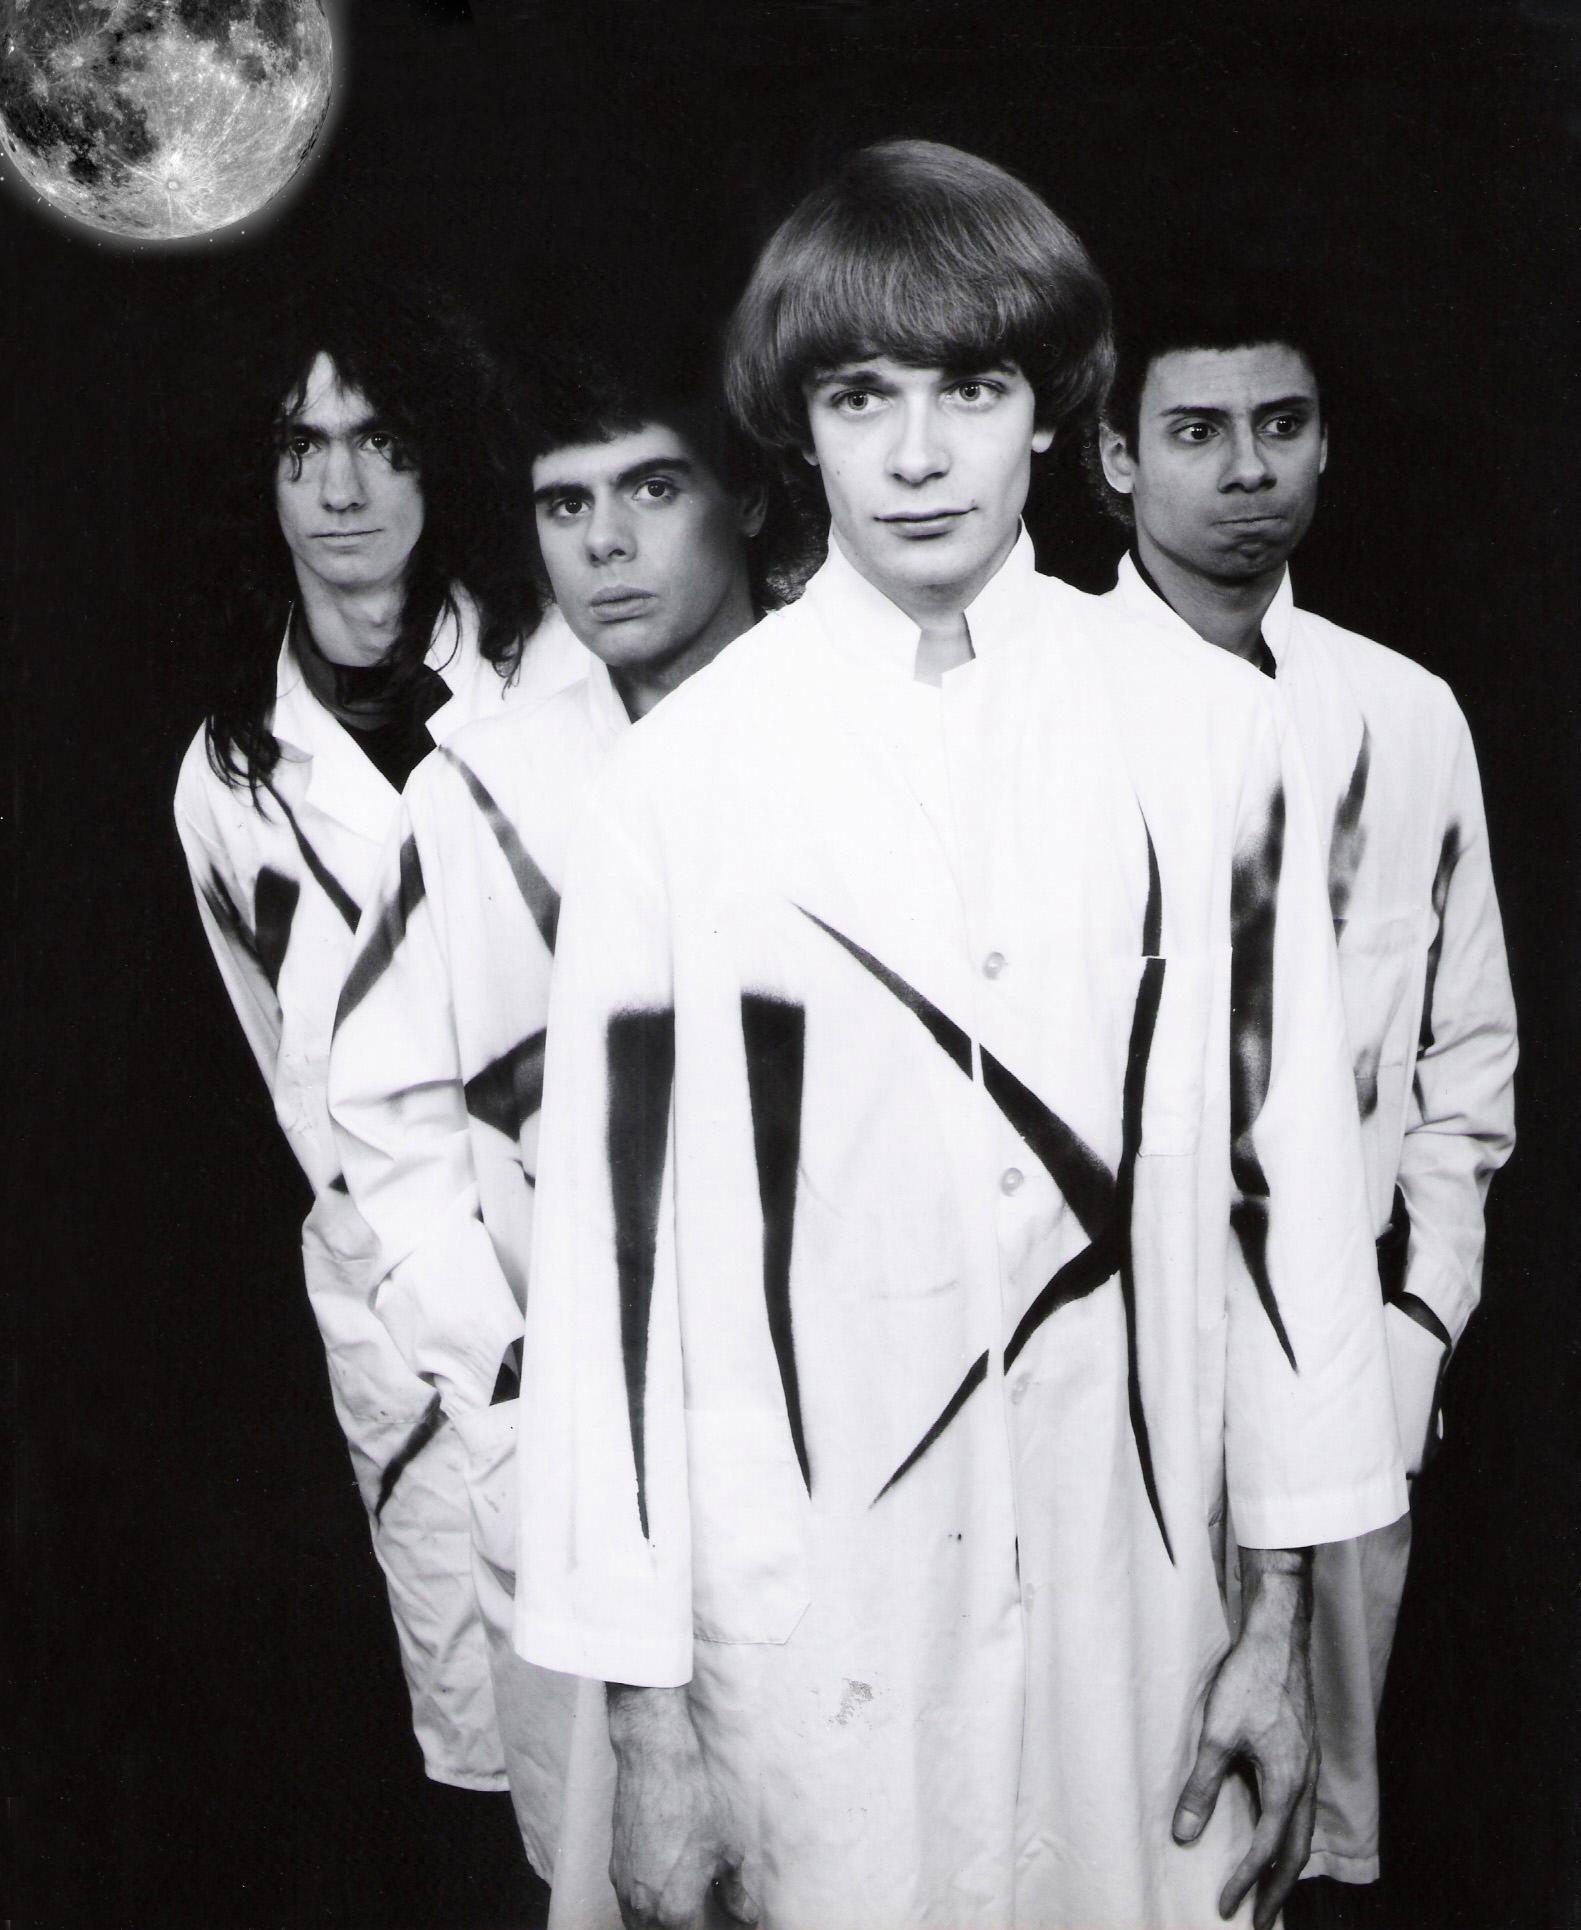 the Fab Four photo 1983-1984